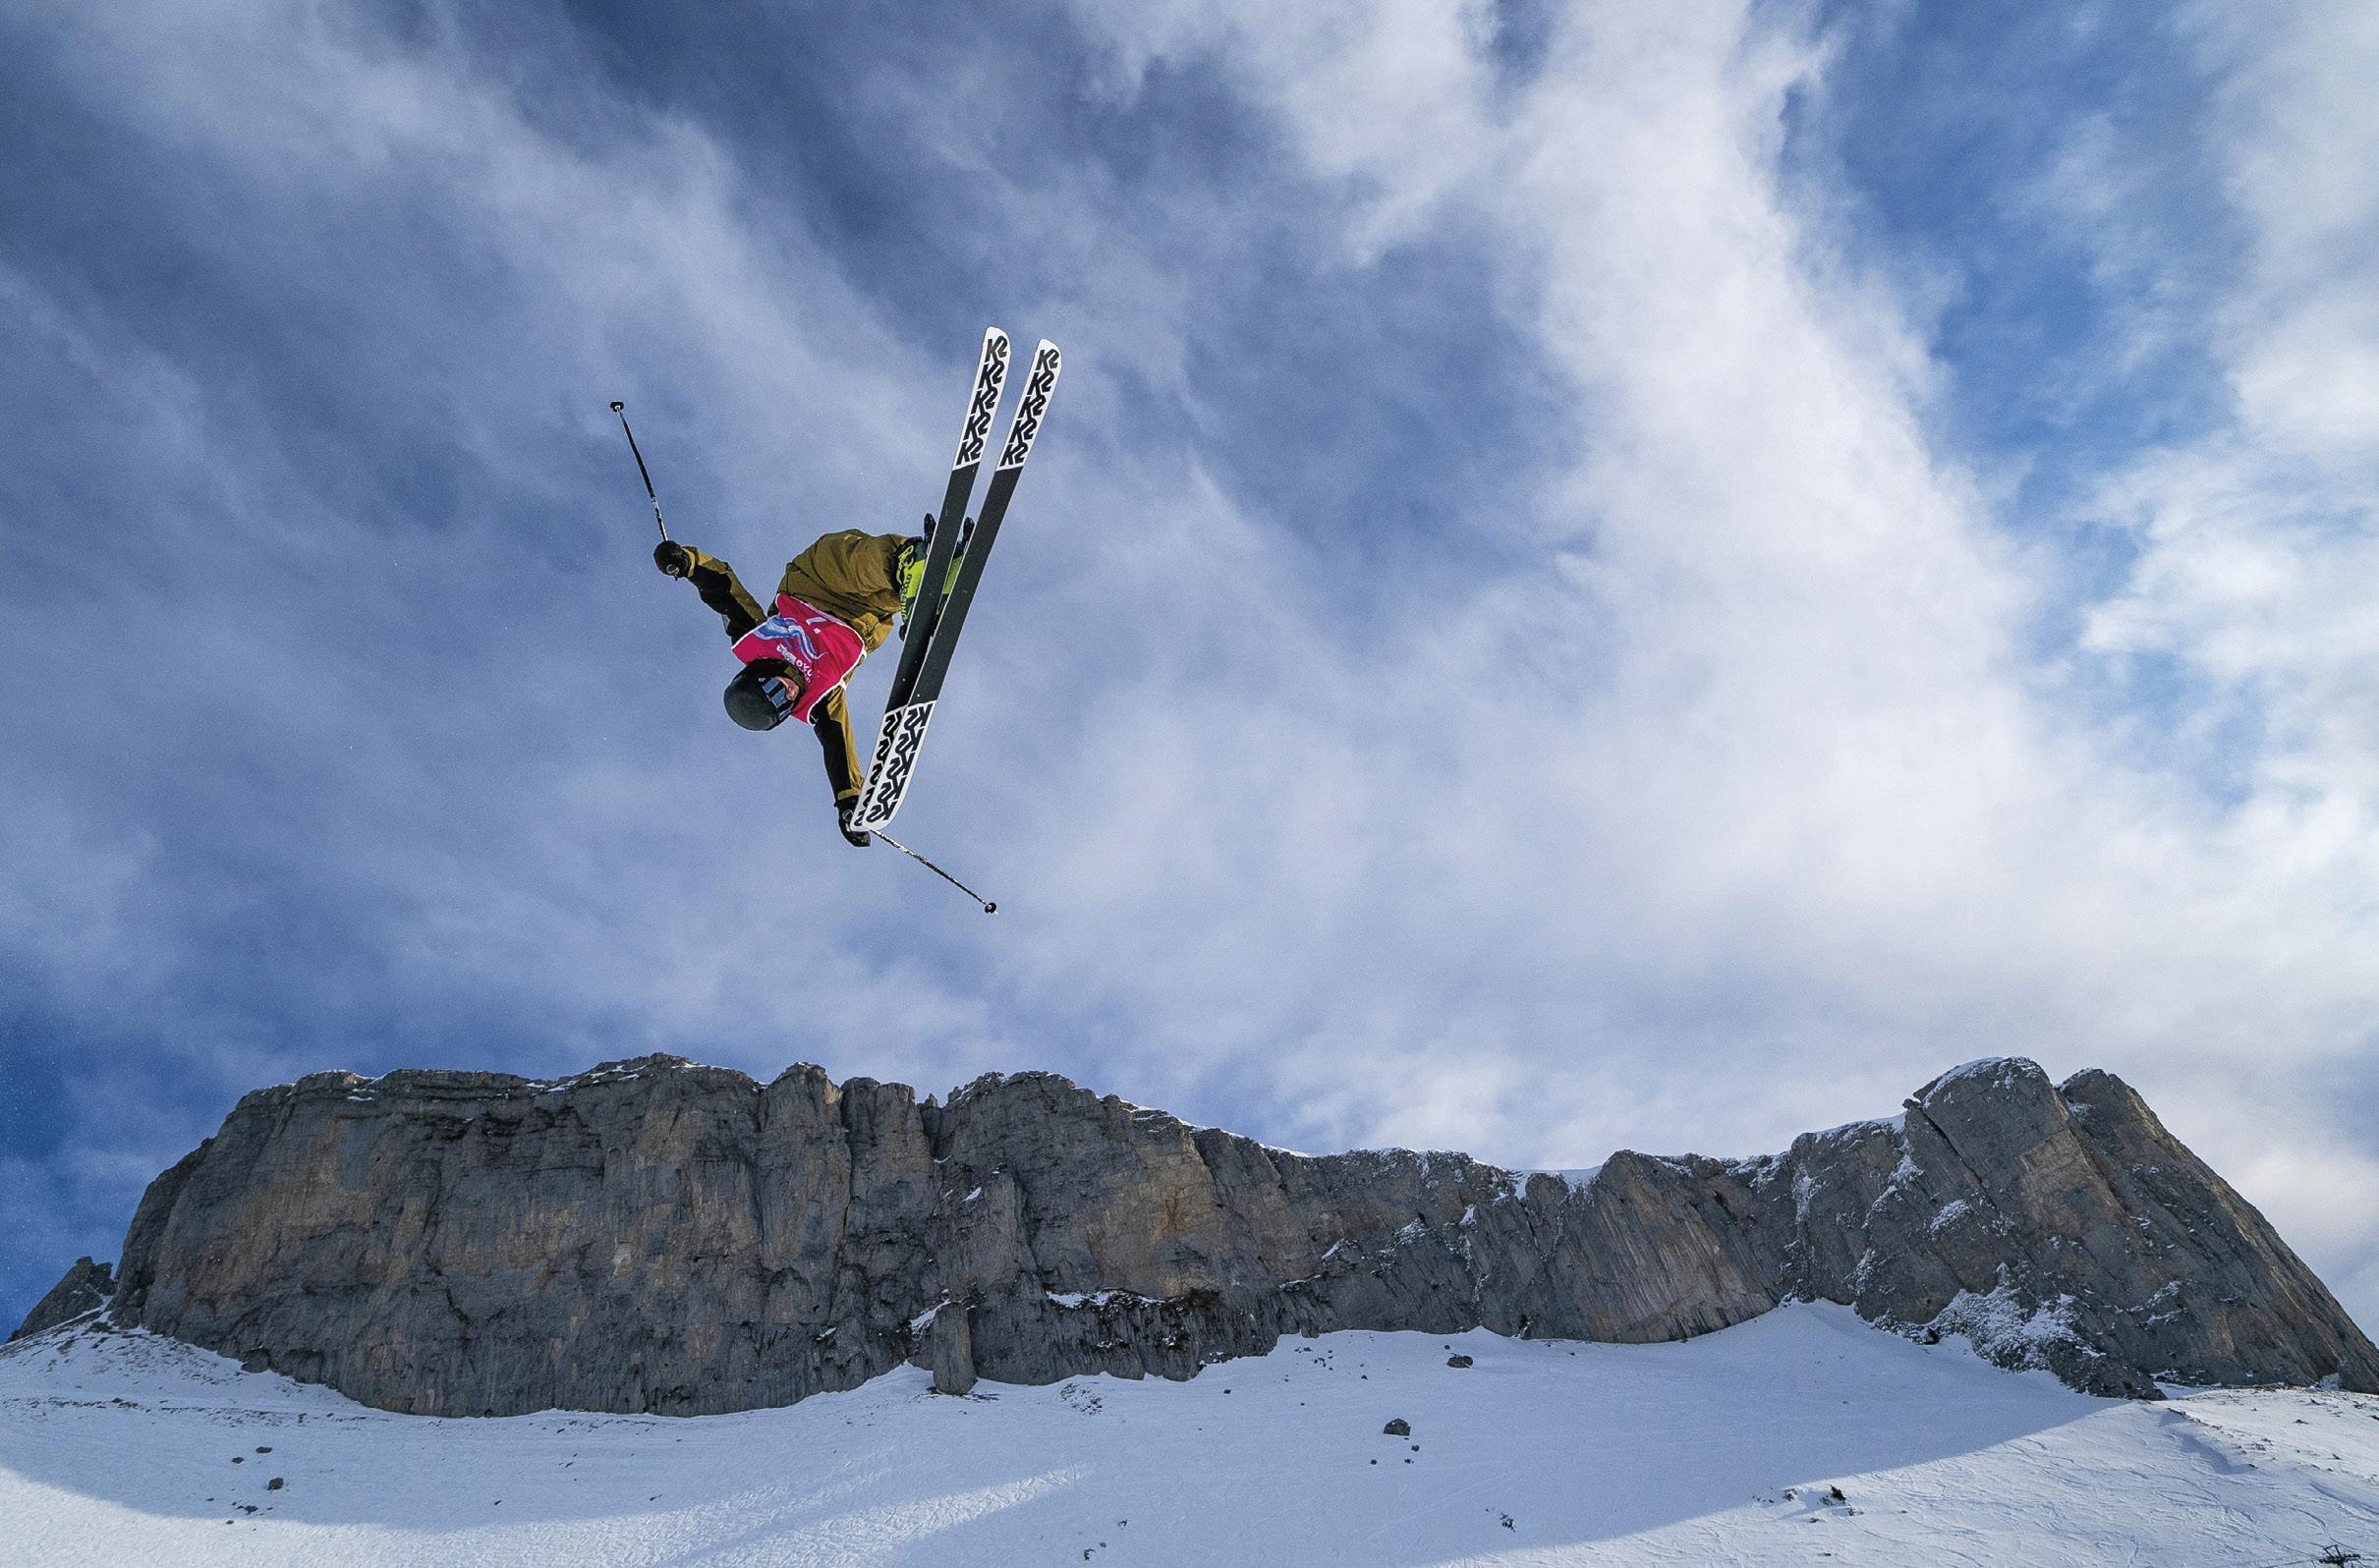 Jogos Olímpicos da Juventude de Inverno Lausanne 2020 em Leysin, Suíça. EPA / BOR MARTIN.